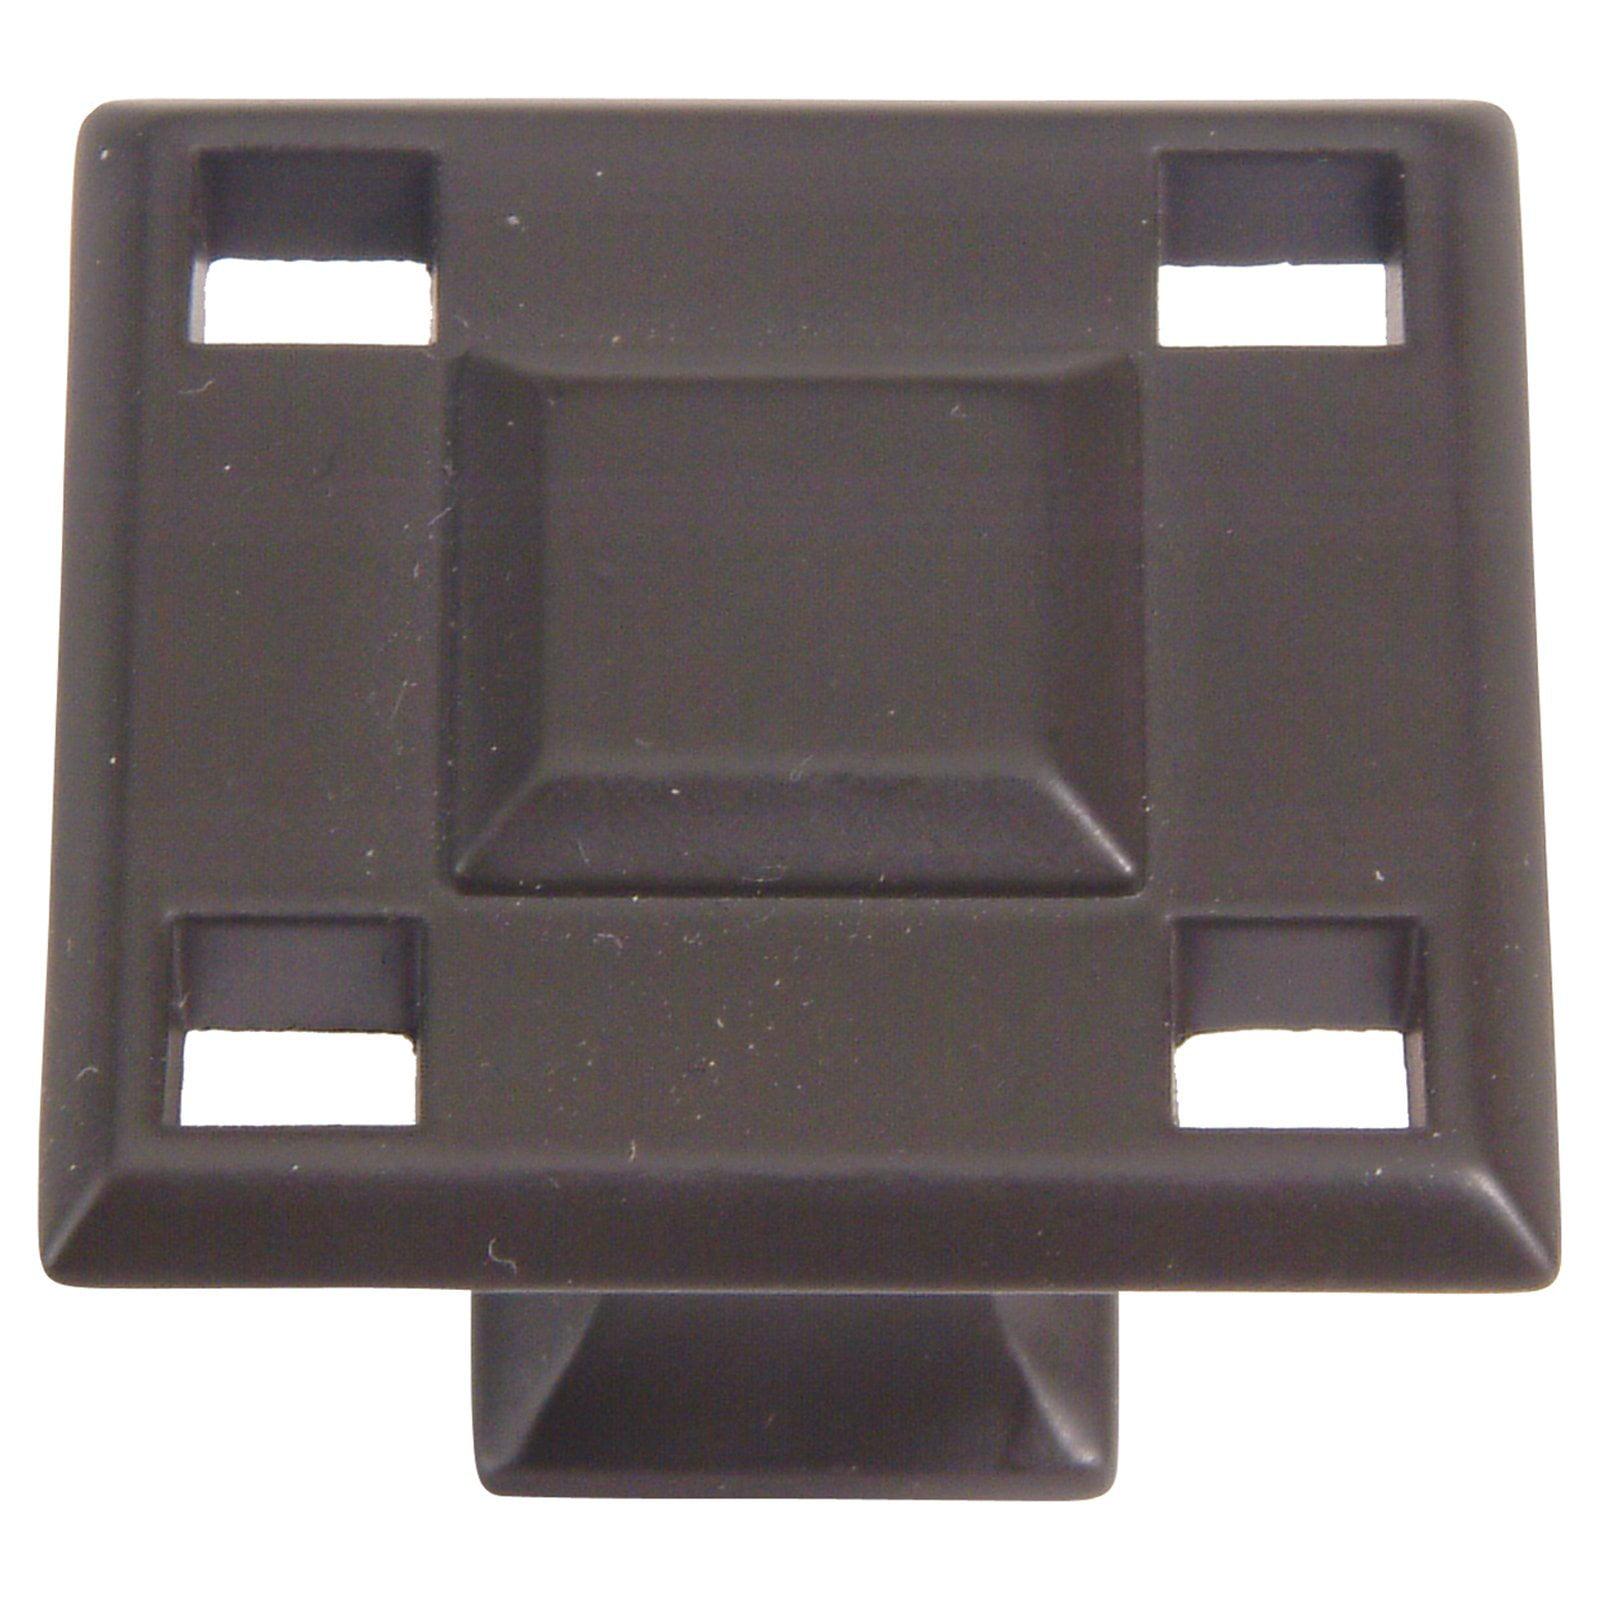 Modern Craftsman 1-3/8 in. Oil Rubbed Bronze Cabinet Knob